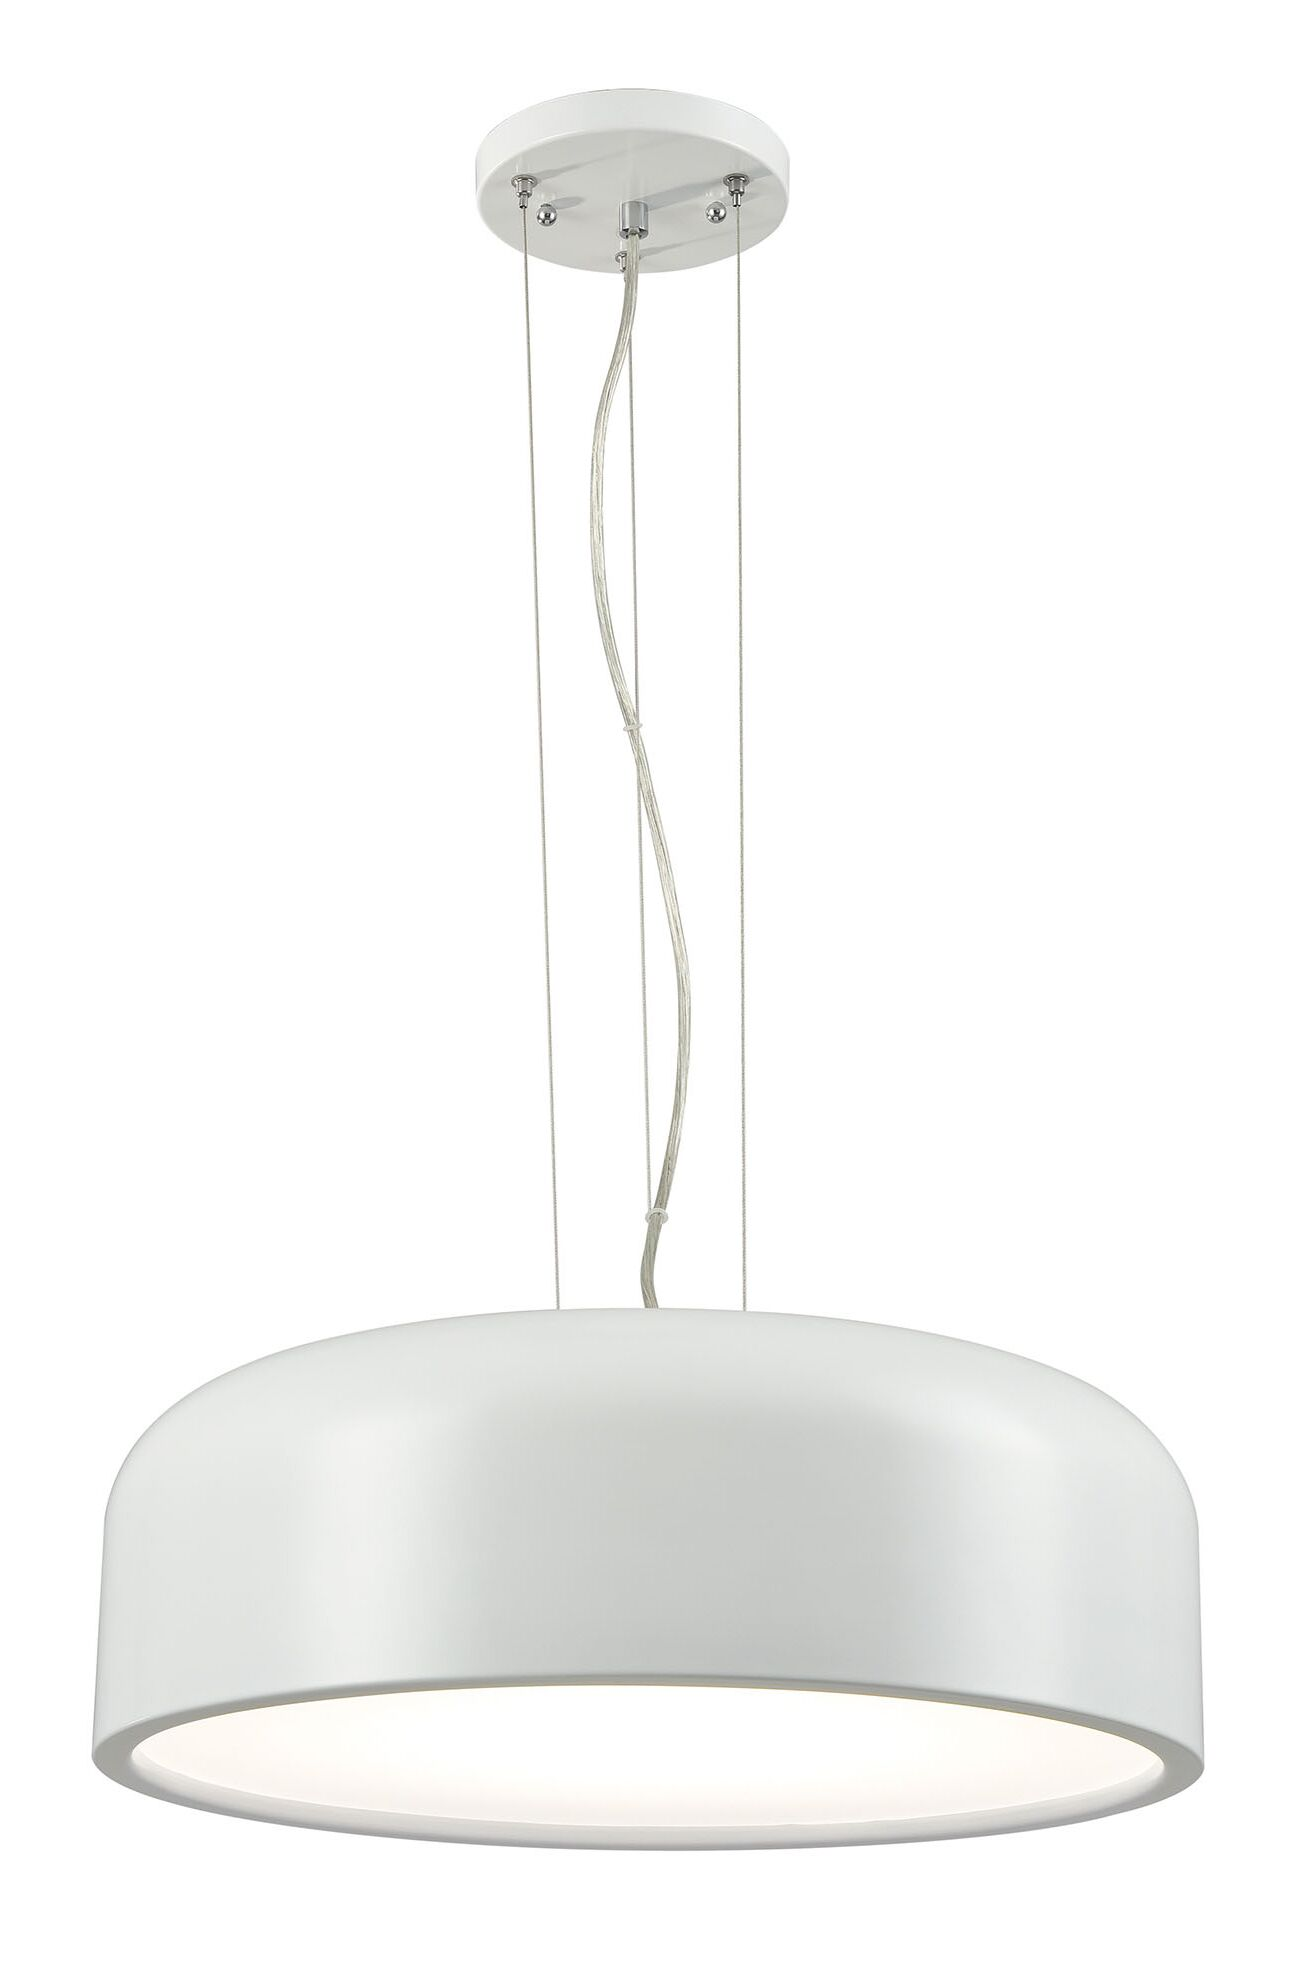 Barksdale 1-Light  LED Drum Pendant